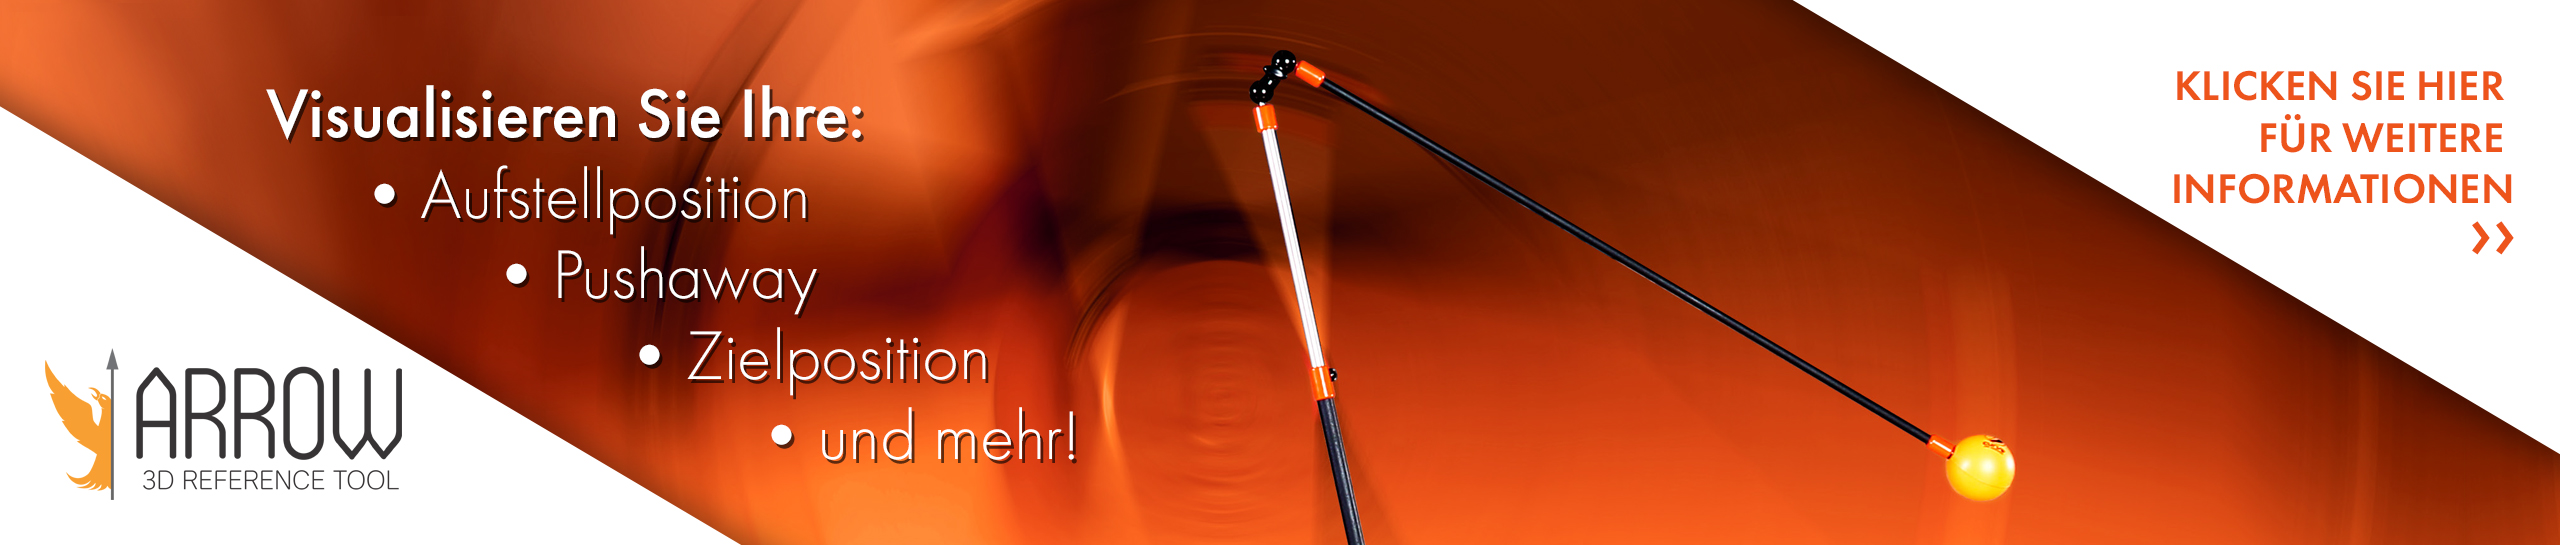 Kegel Arrow 3D Reference Tool